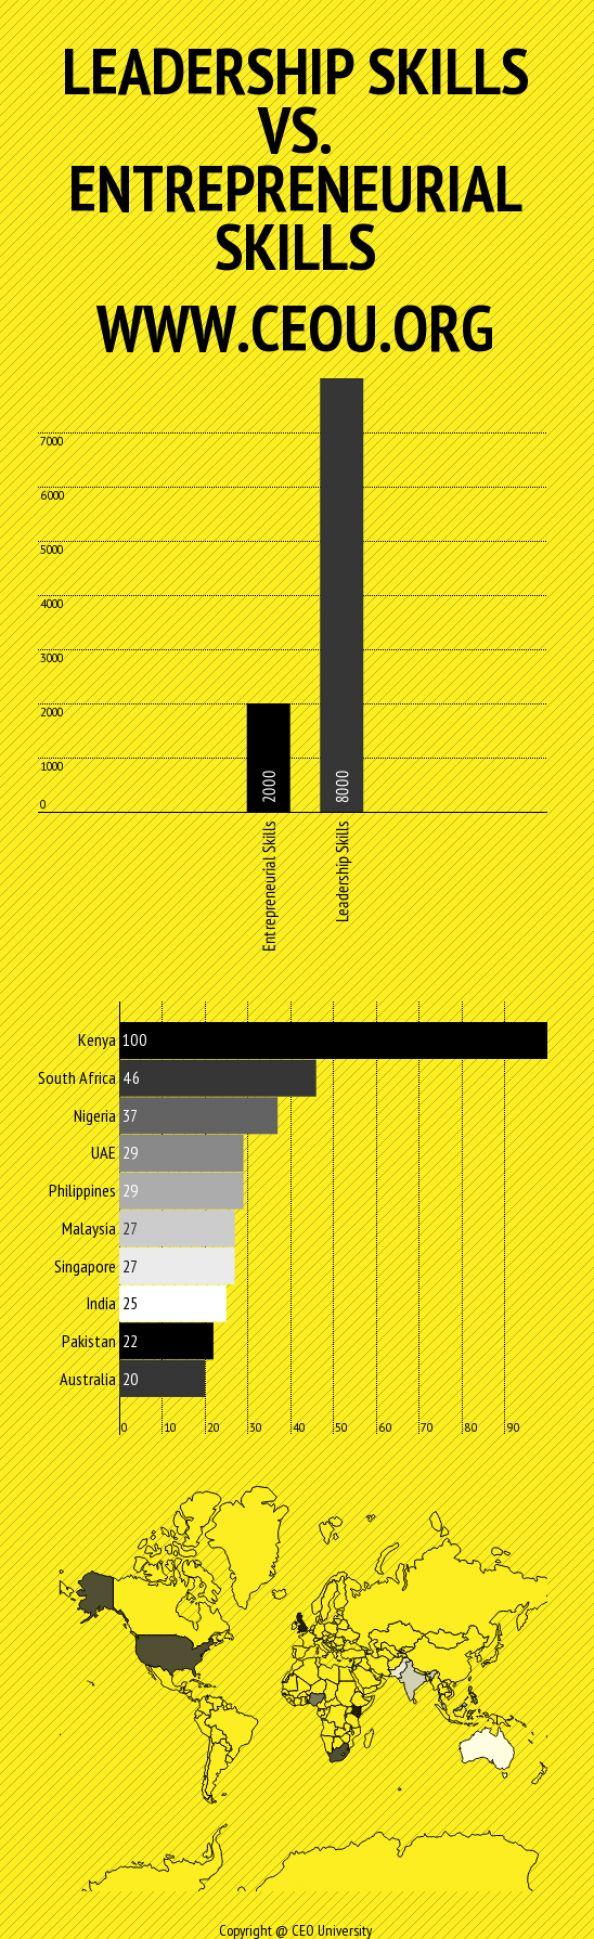 Leadership Skills and Entrepreneurial Skills Stats Infographic